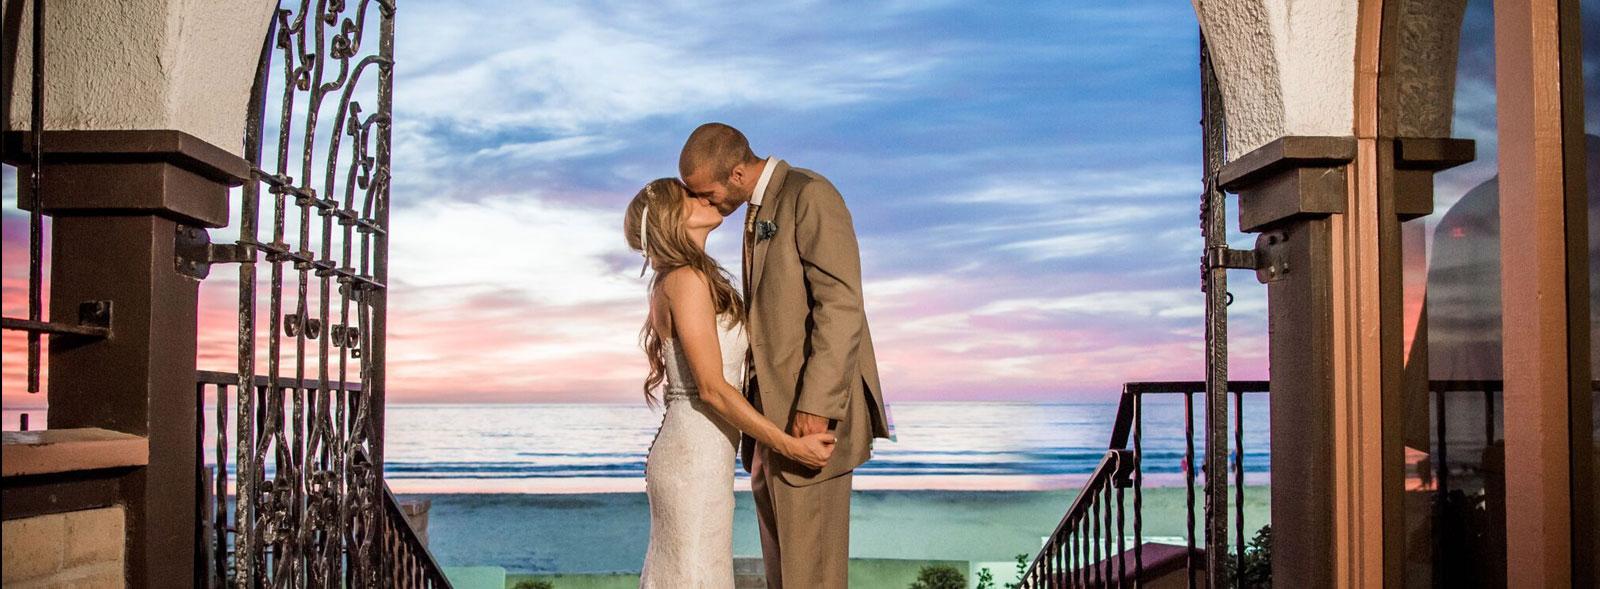 Wedding Overview of La Jolla Shores Hotel California